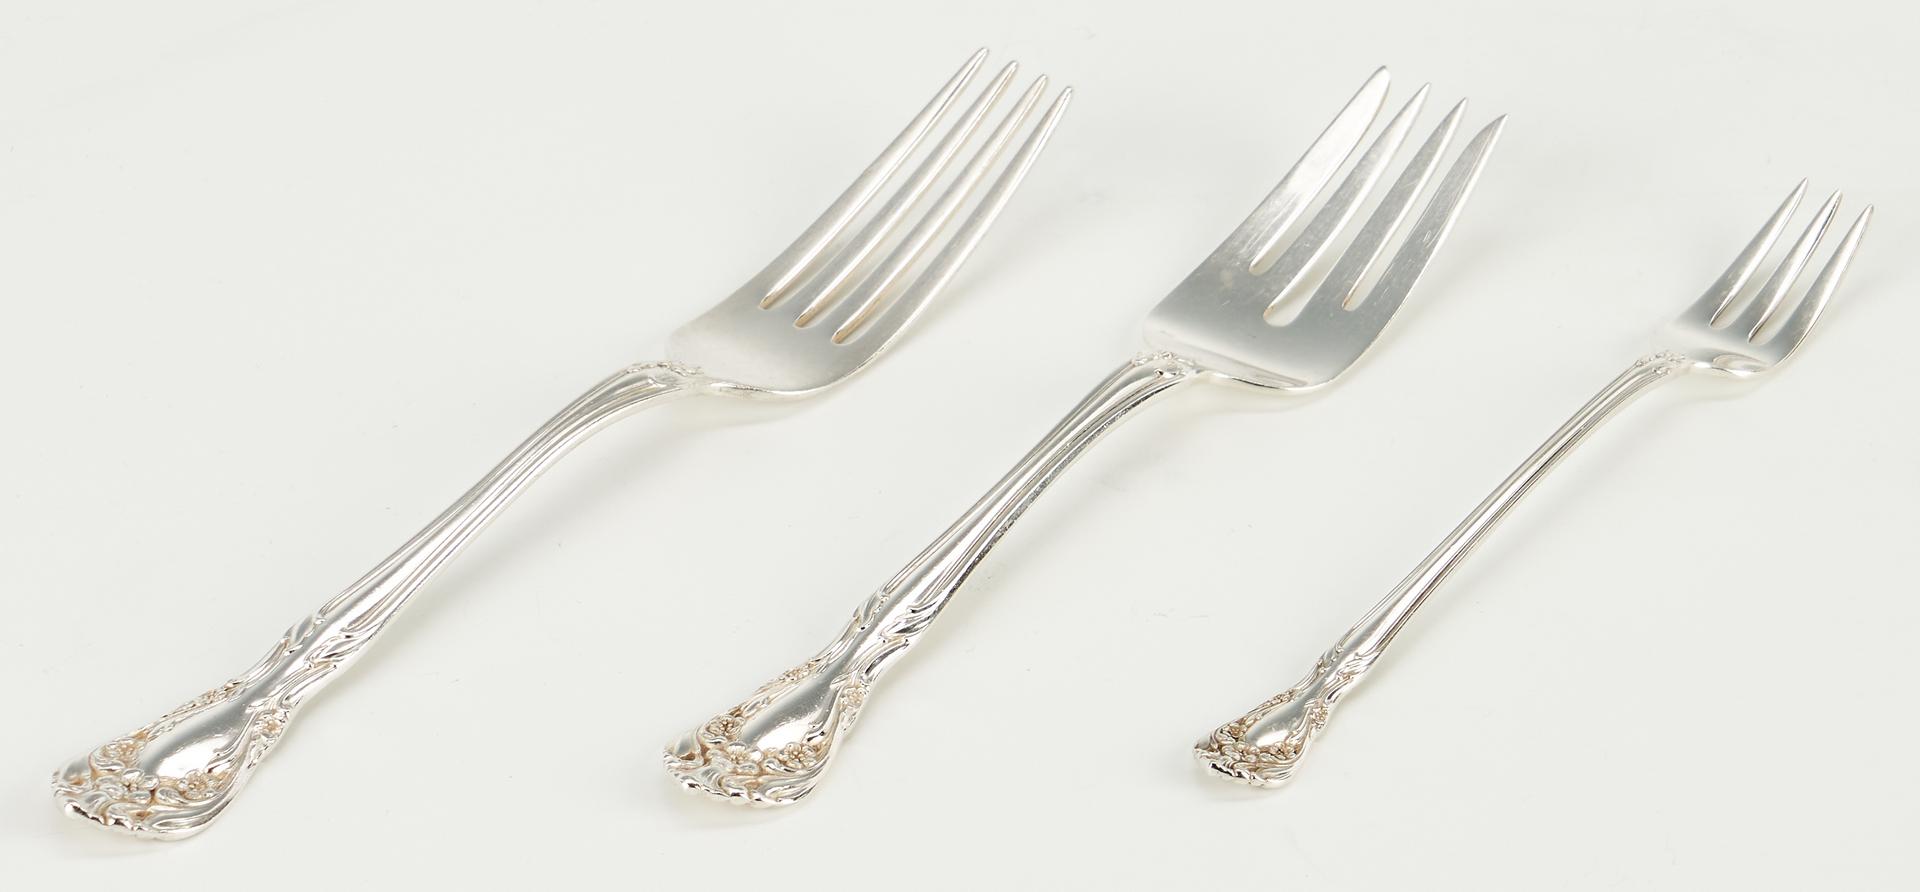 Lot 504: 46 Pcs. Sterling Silver incl. Goblets & Flatware